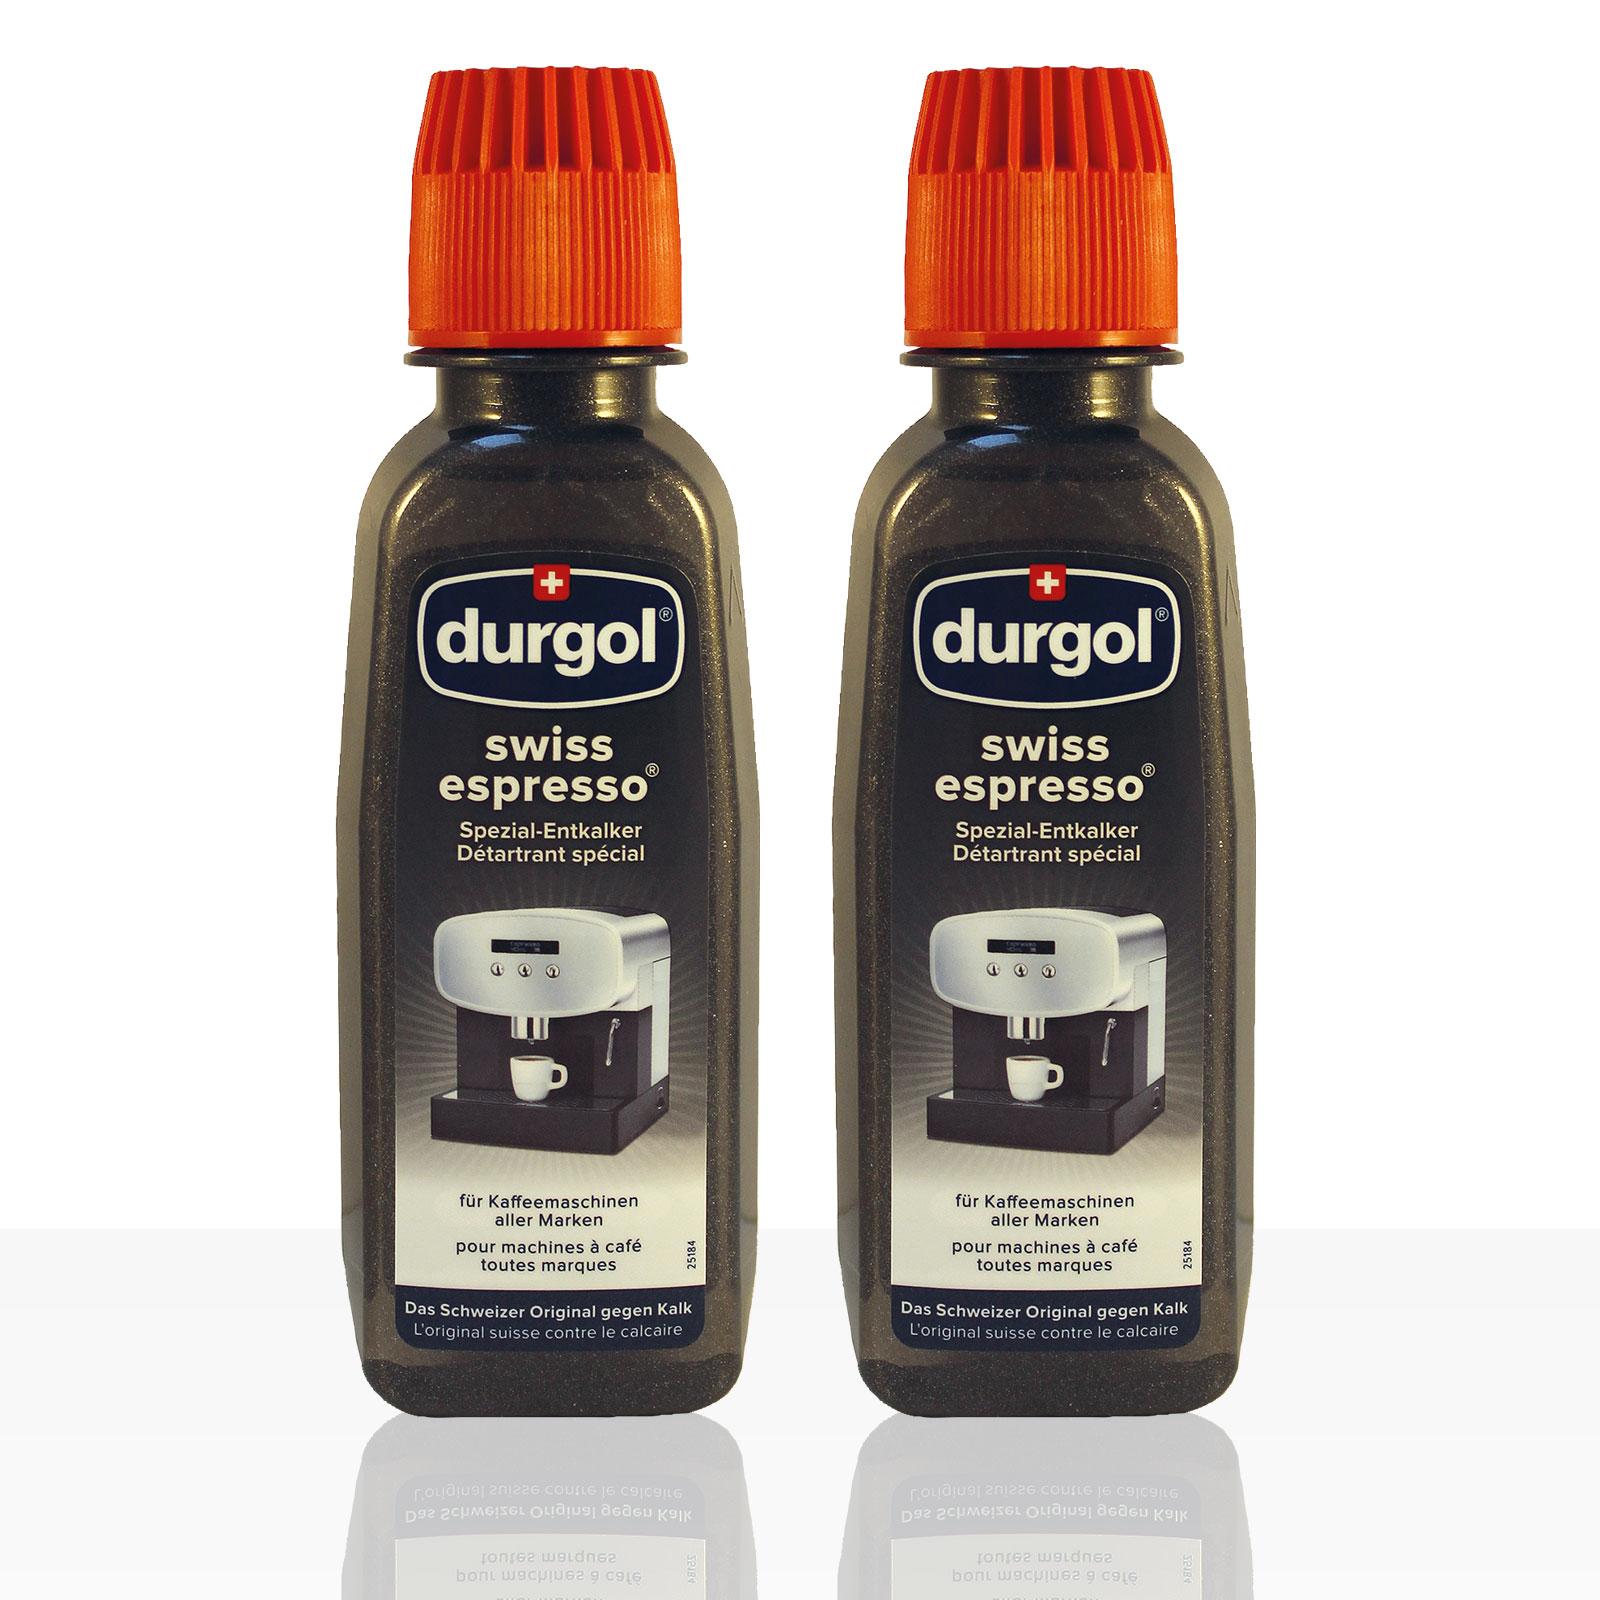 Durgol Swiss Espresso Spezial Flüssig-Entkalker 125ml, 2Stk